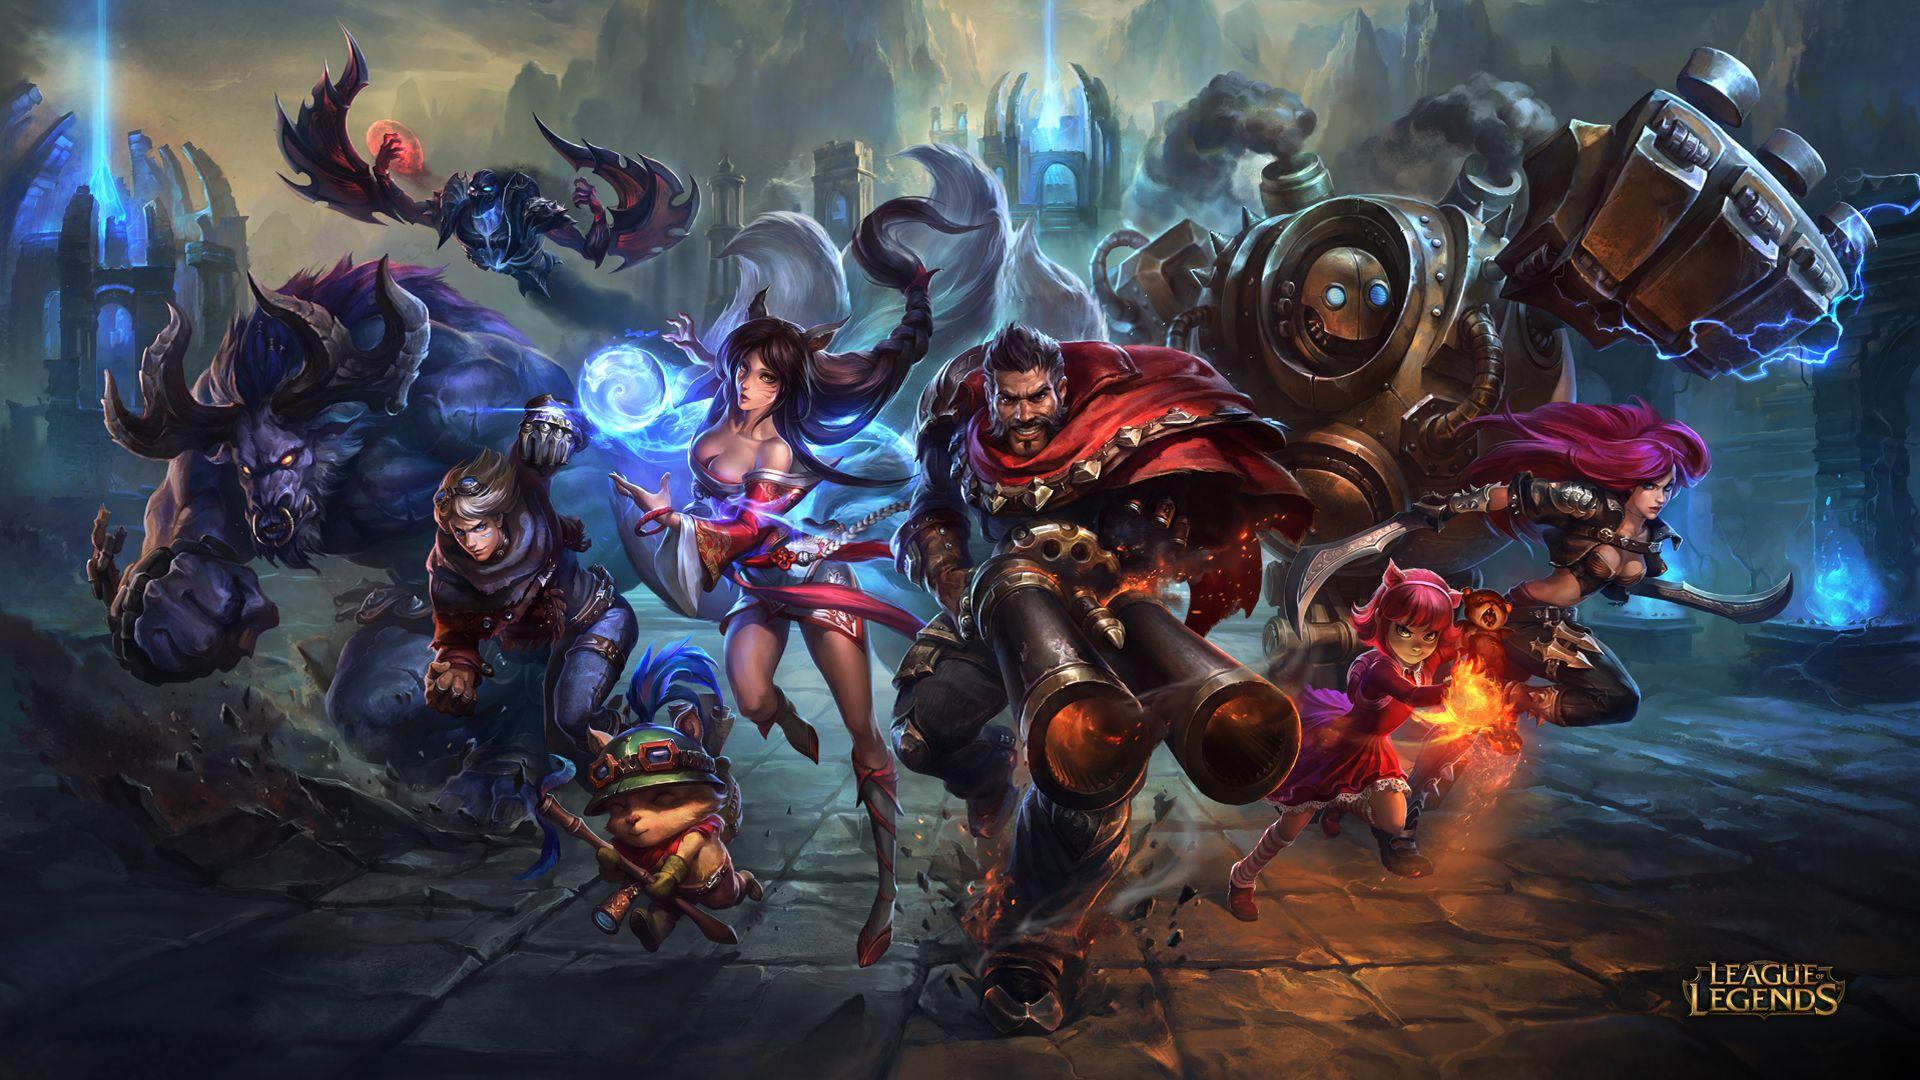 Team Graves - League of Legends Wallpapers